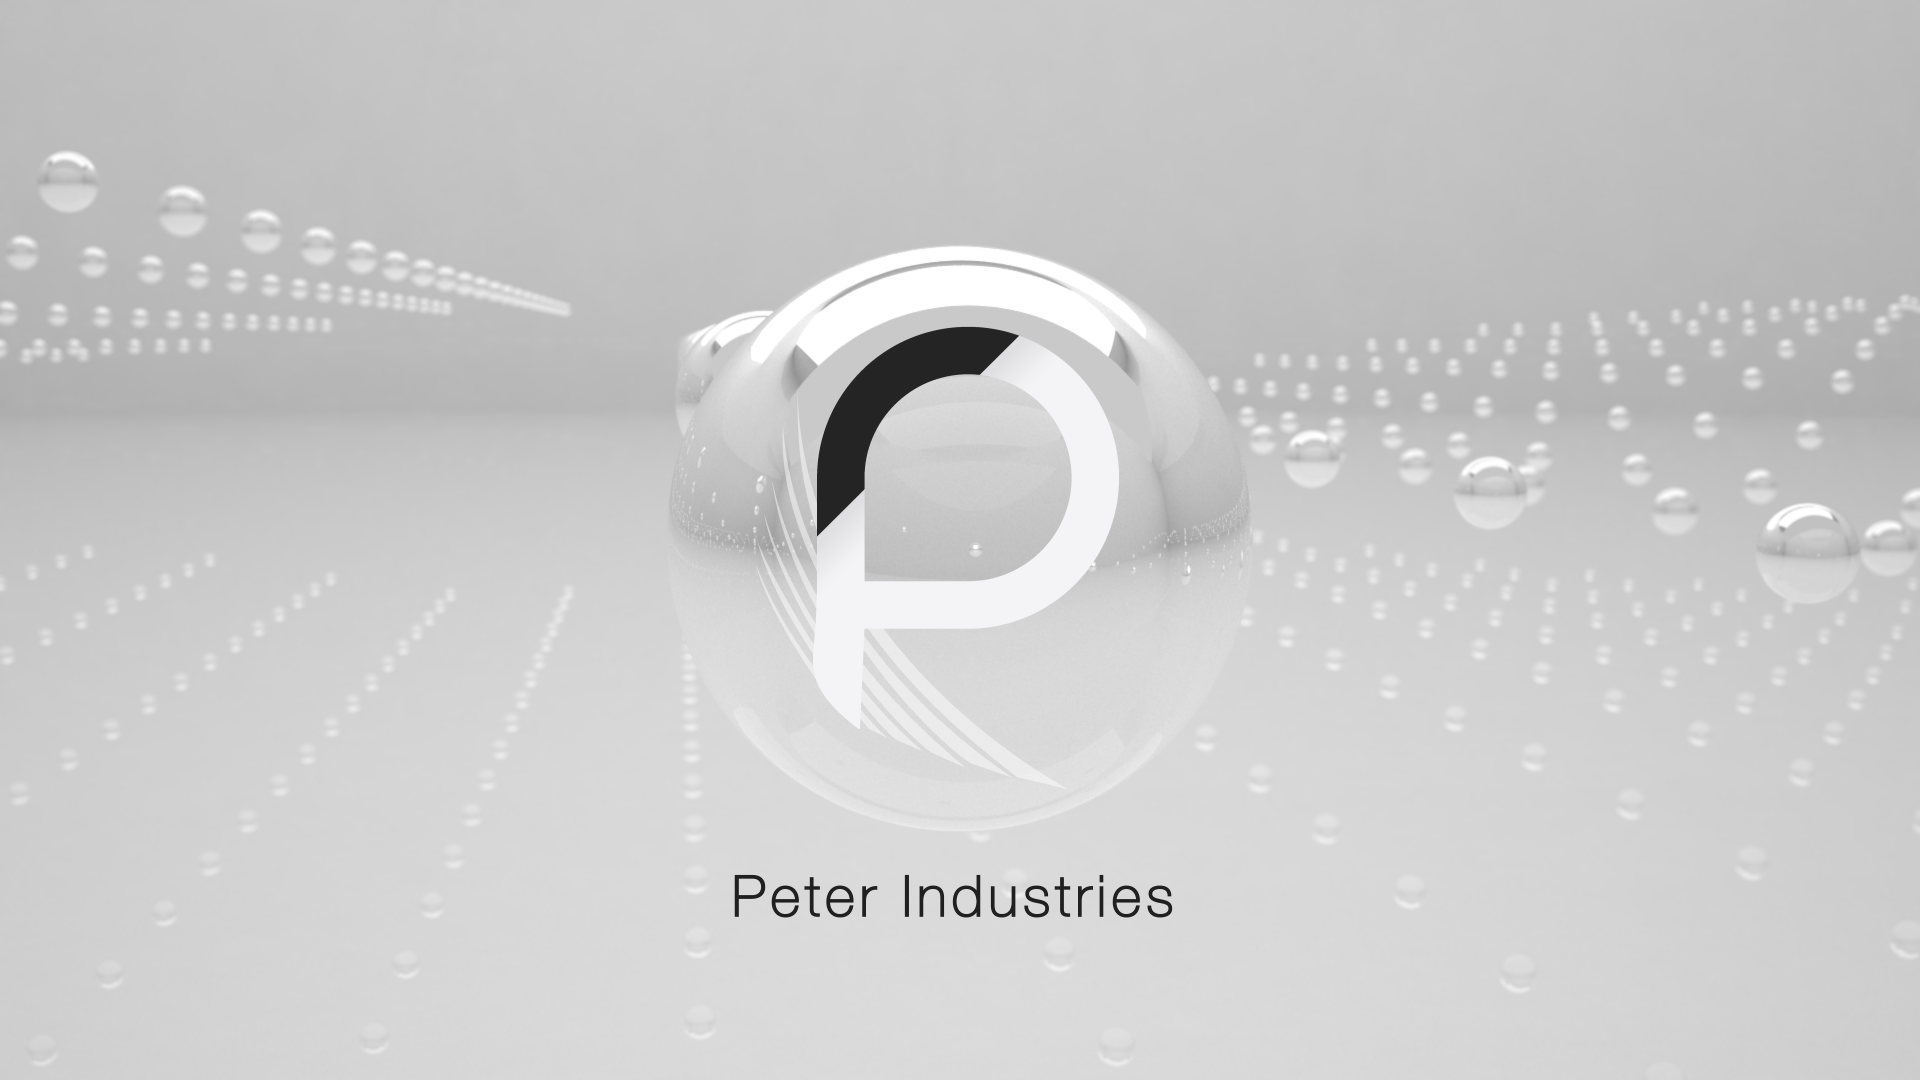 Peter Industries logo